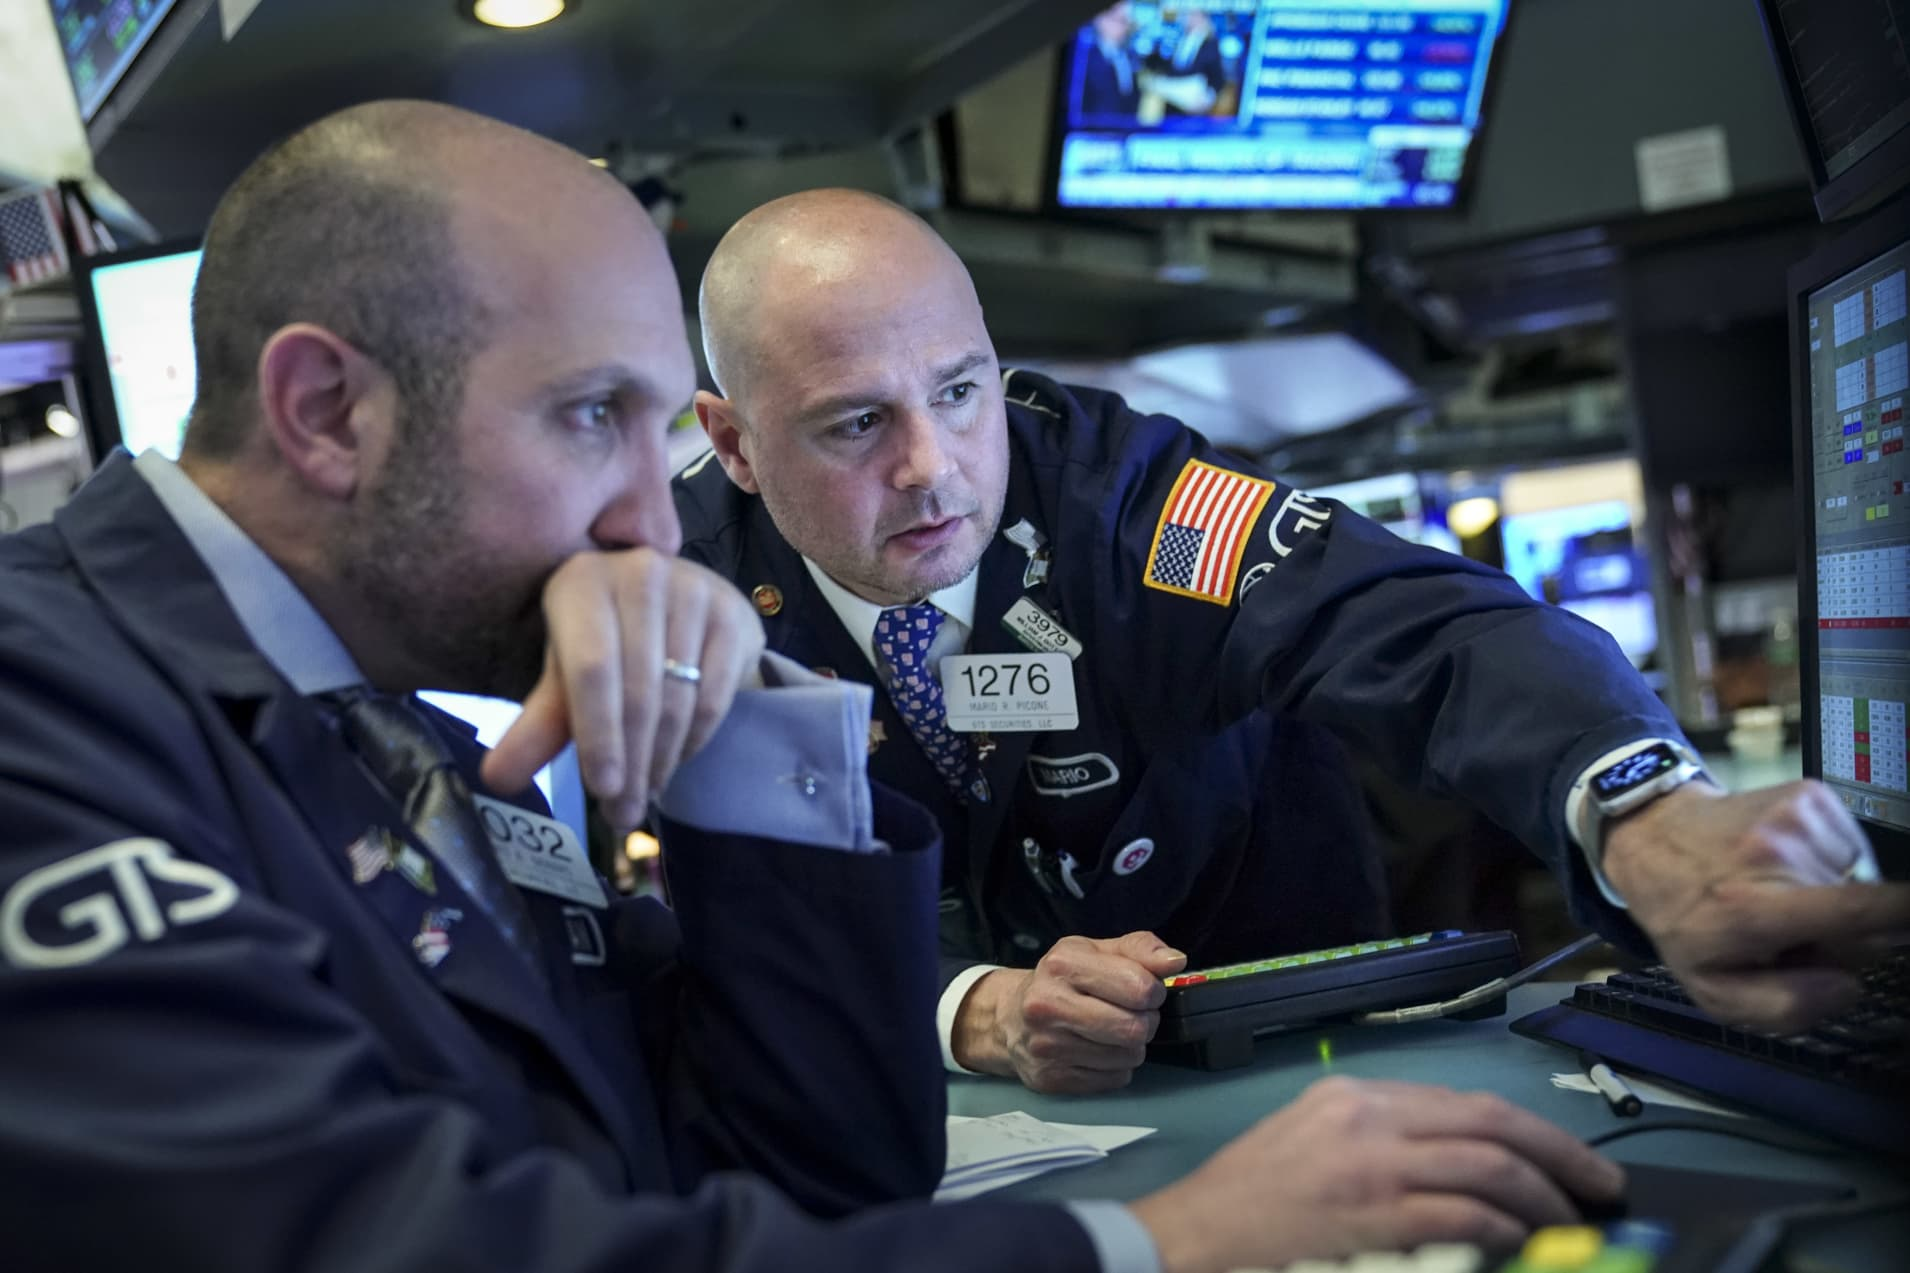 Stocks making the biggest moves premarket: Goldman Sachs, CVS, Best Buy, Facebook & more